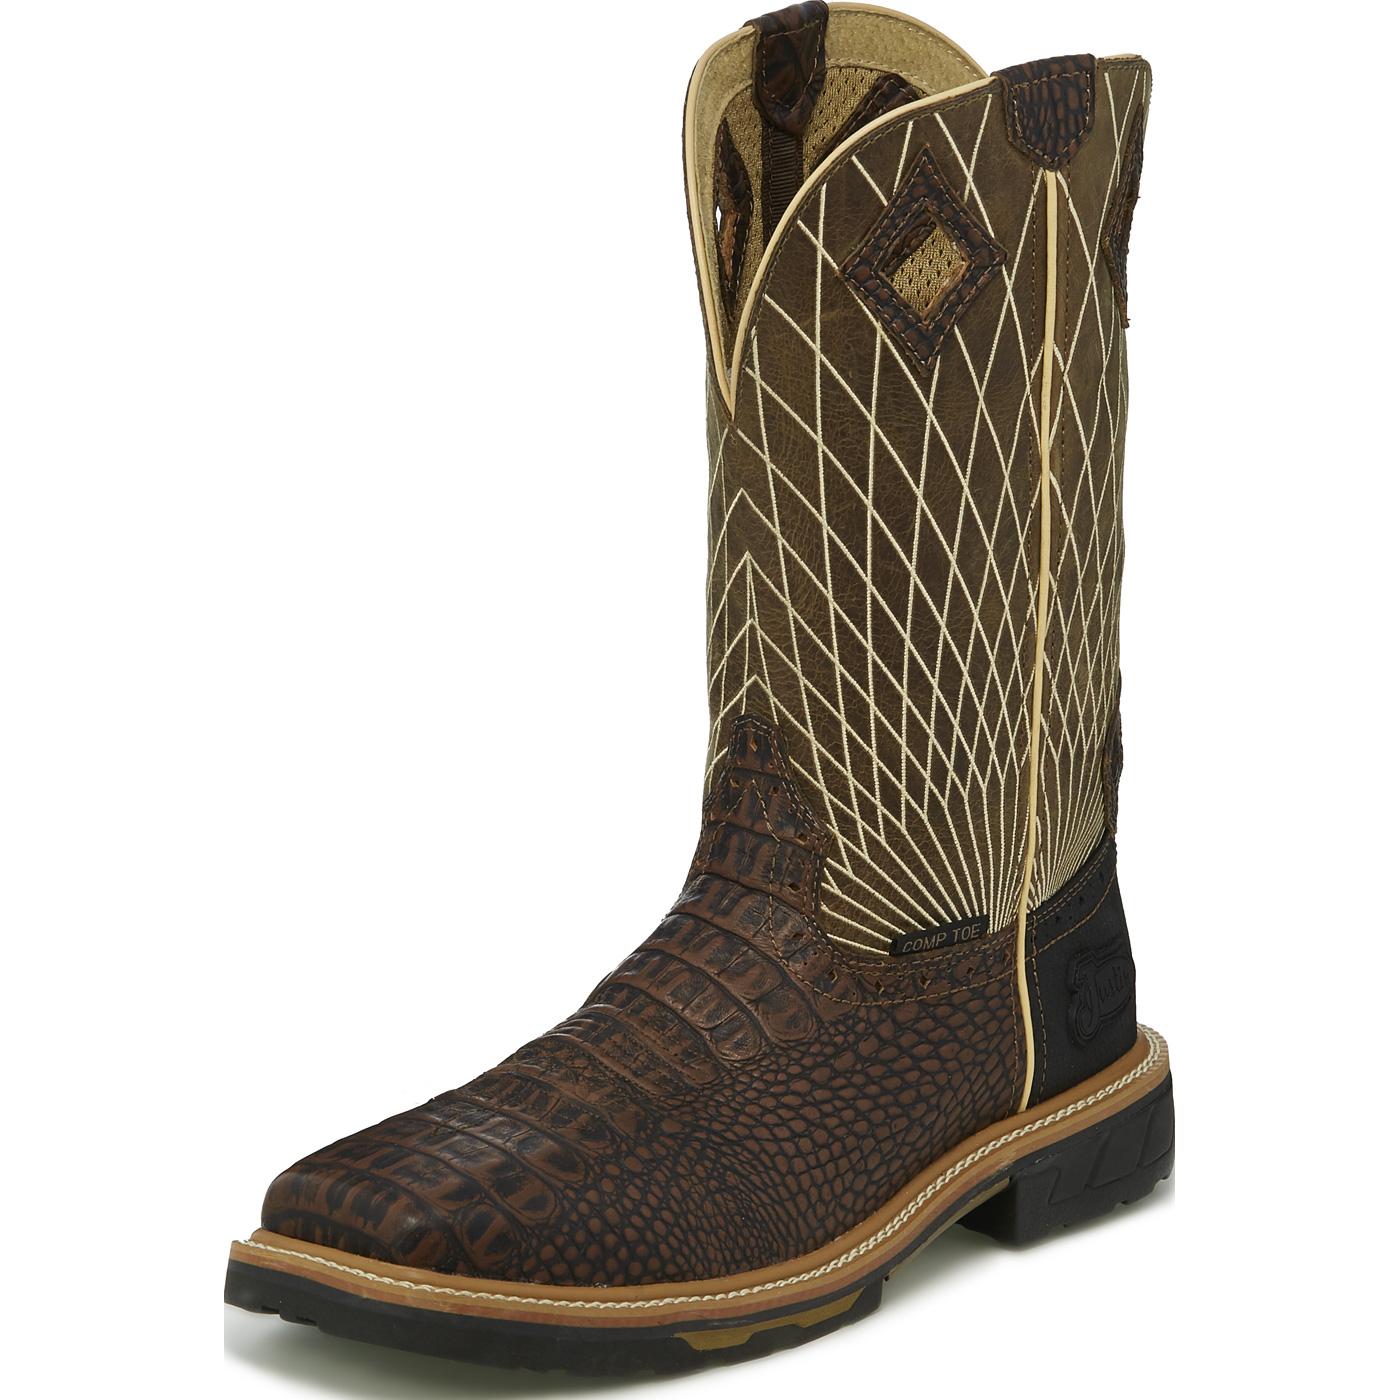 8d2472ab395 Justin Work Hybred® Derrickman Croc Print Men's 12 inch Composite Toe  Electrical Hazard Pull-on Western Work Boots